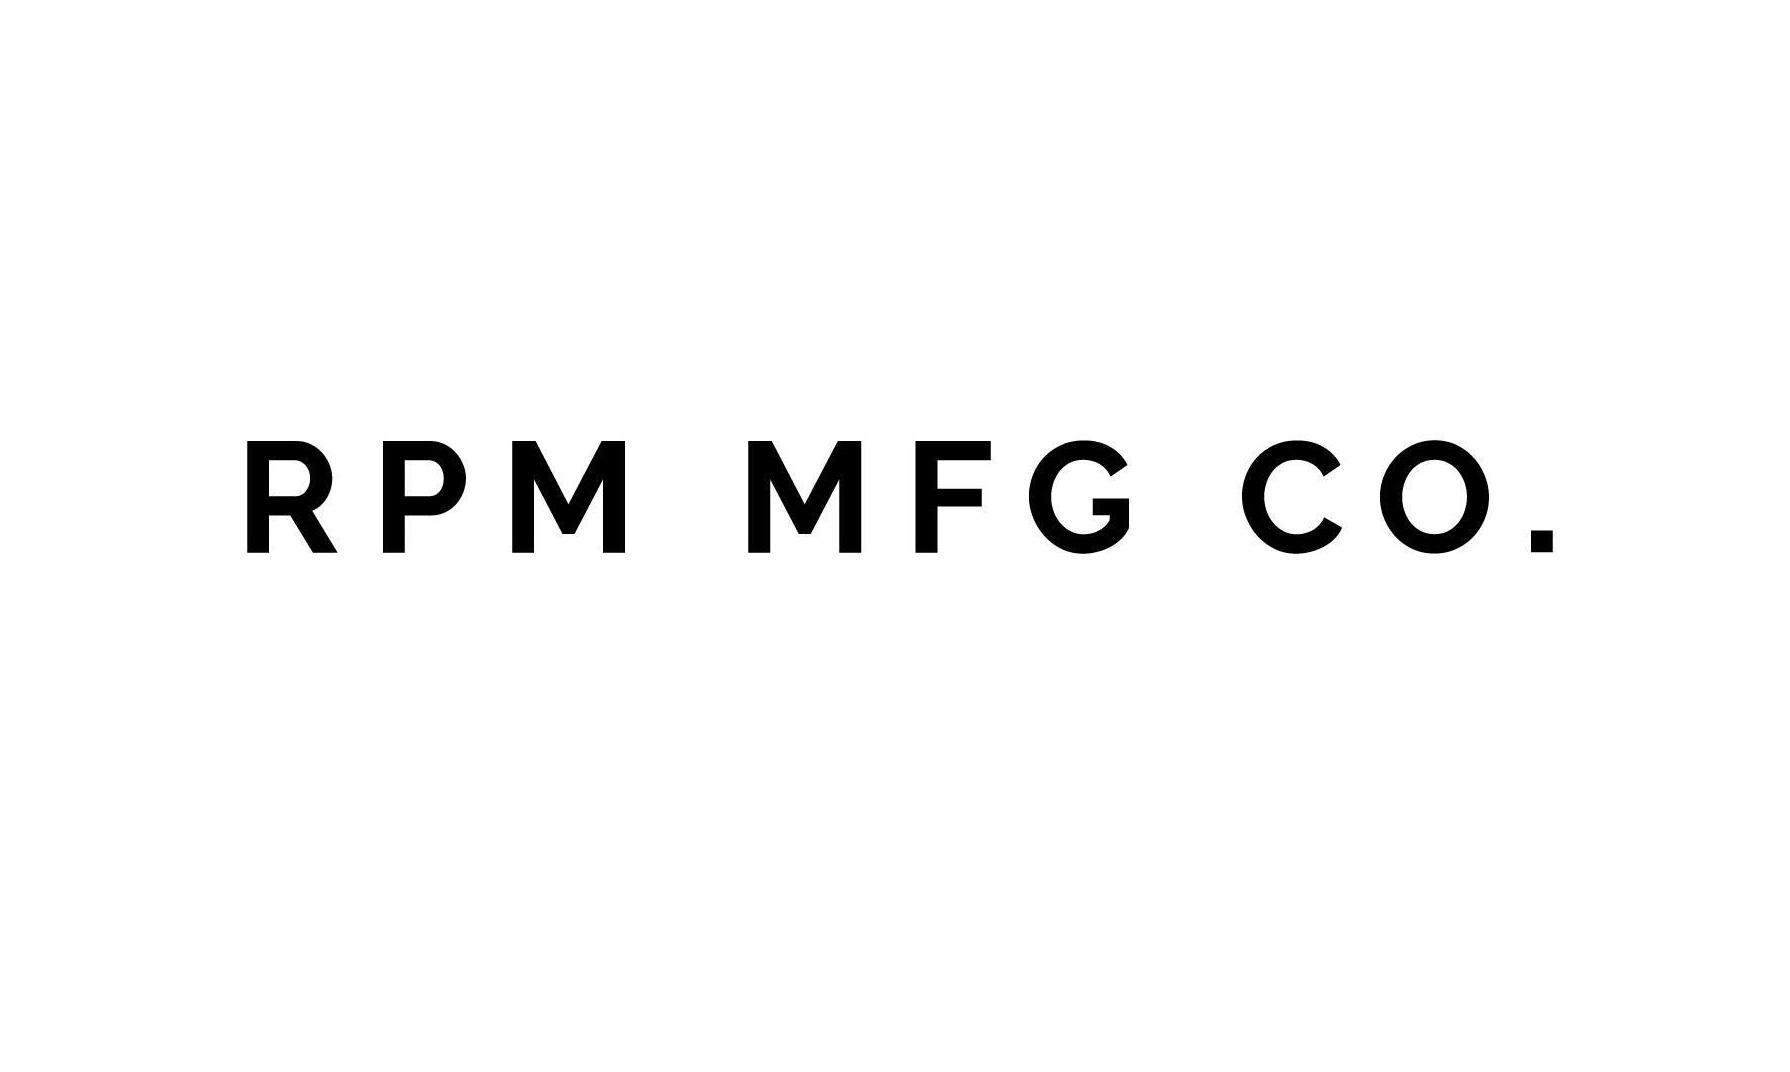 RPM%2BMFG%2BCO.jpg